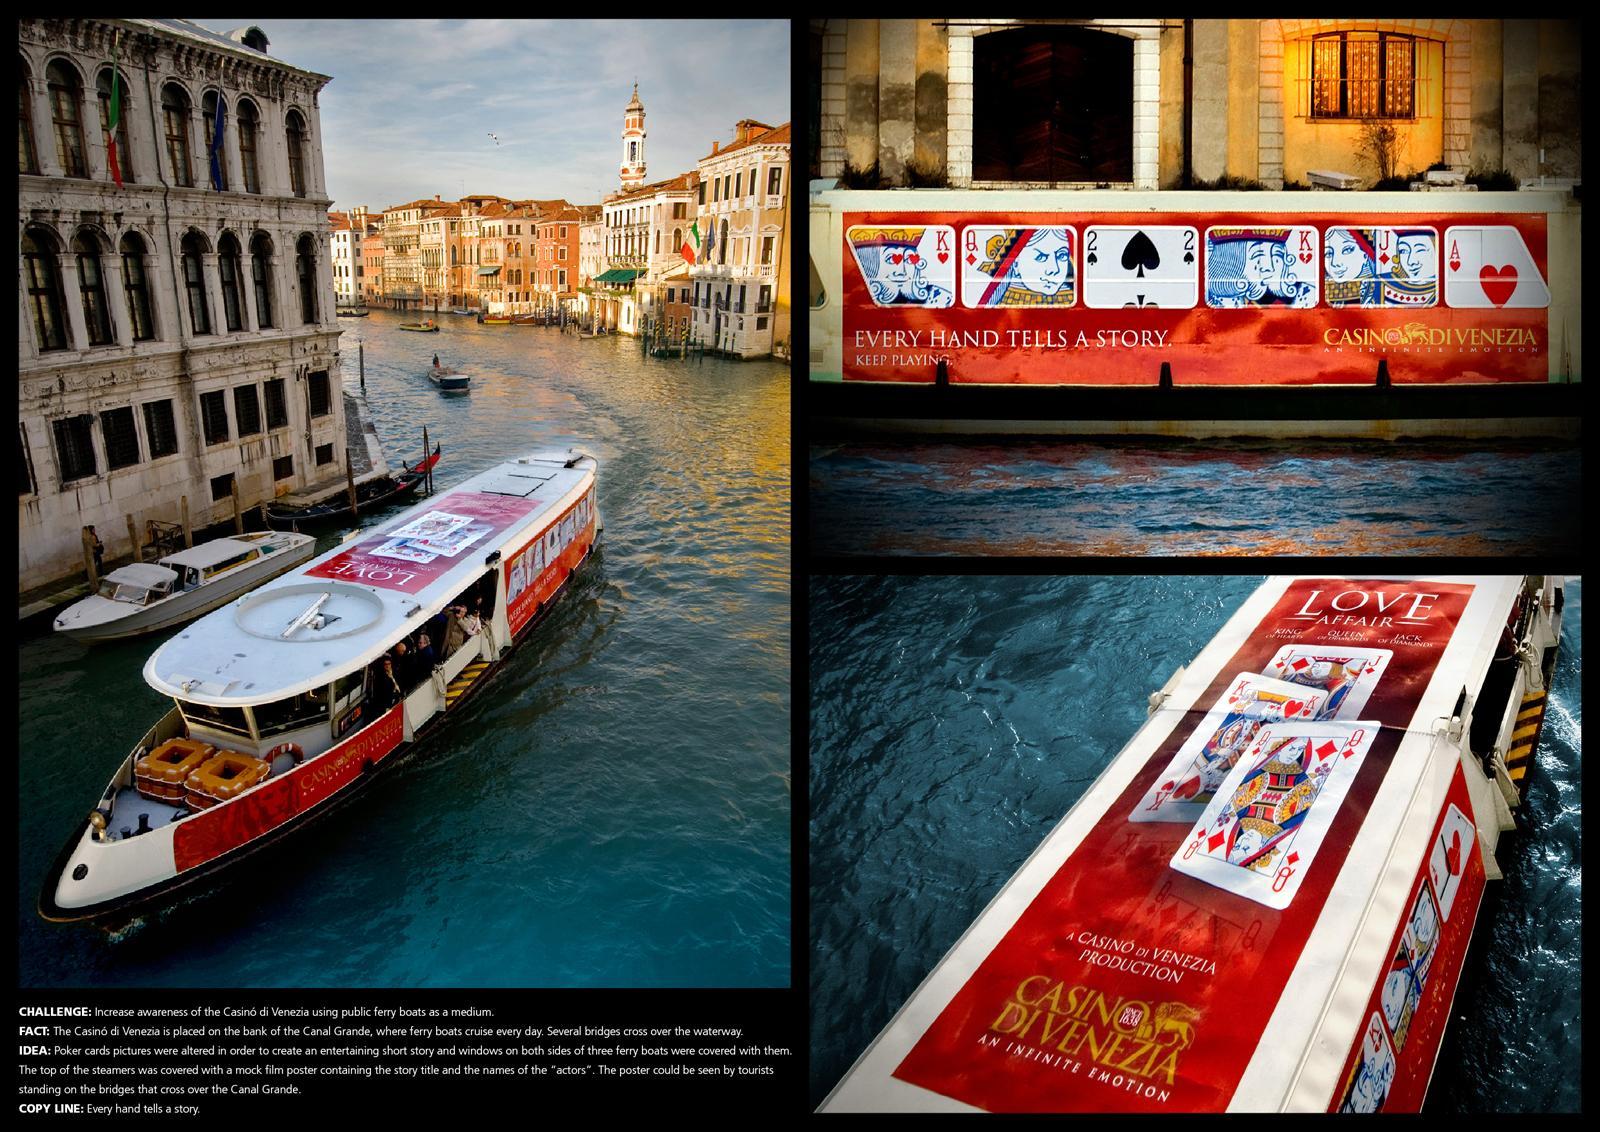 Casino di Venezia Outdoor Ad -  Every hand tells a story